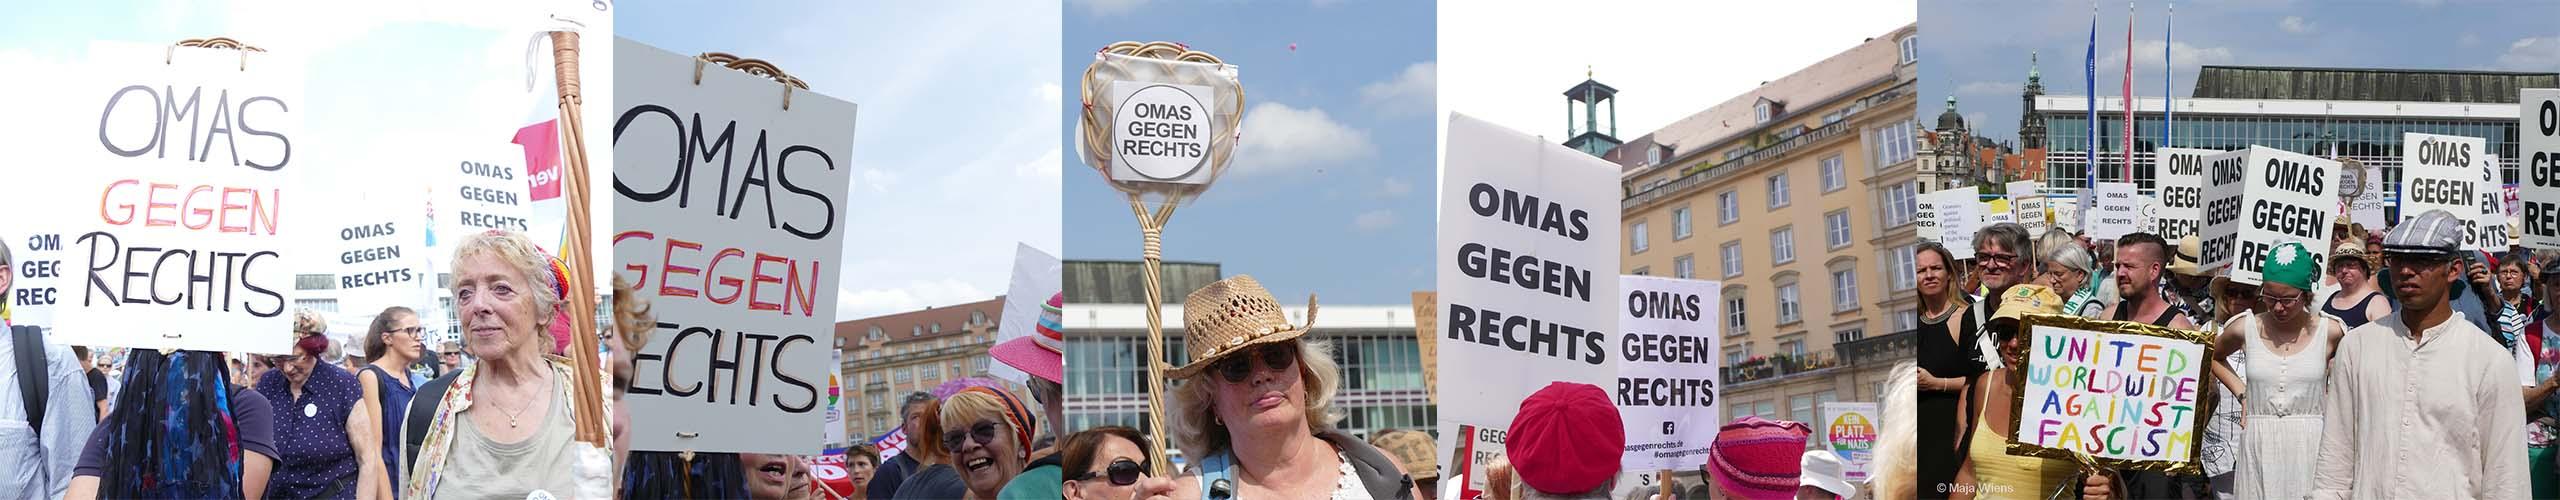 OMAS GEGEN RECHTS DEUTSCHLAND-BÜNDNIS